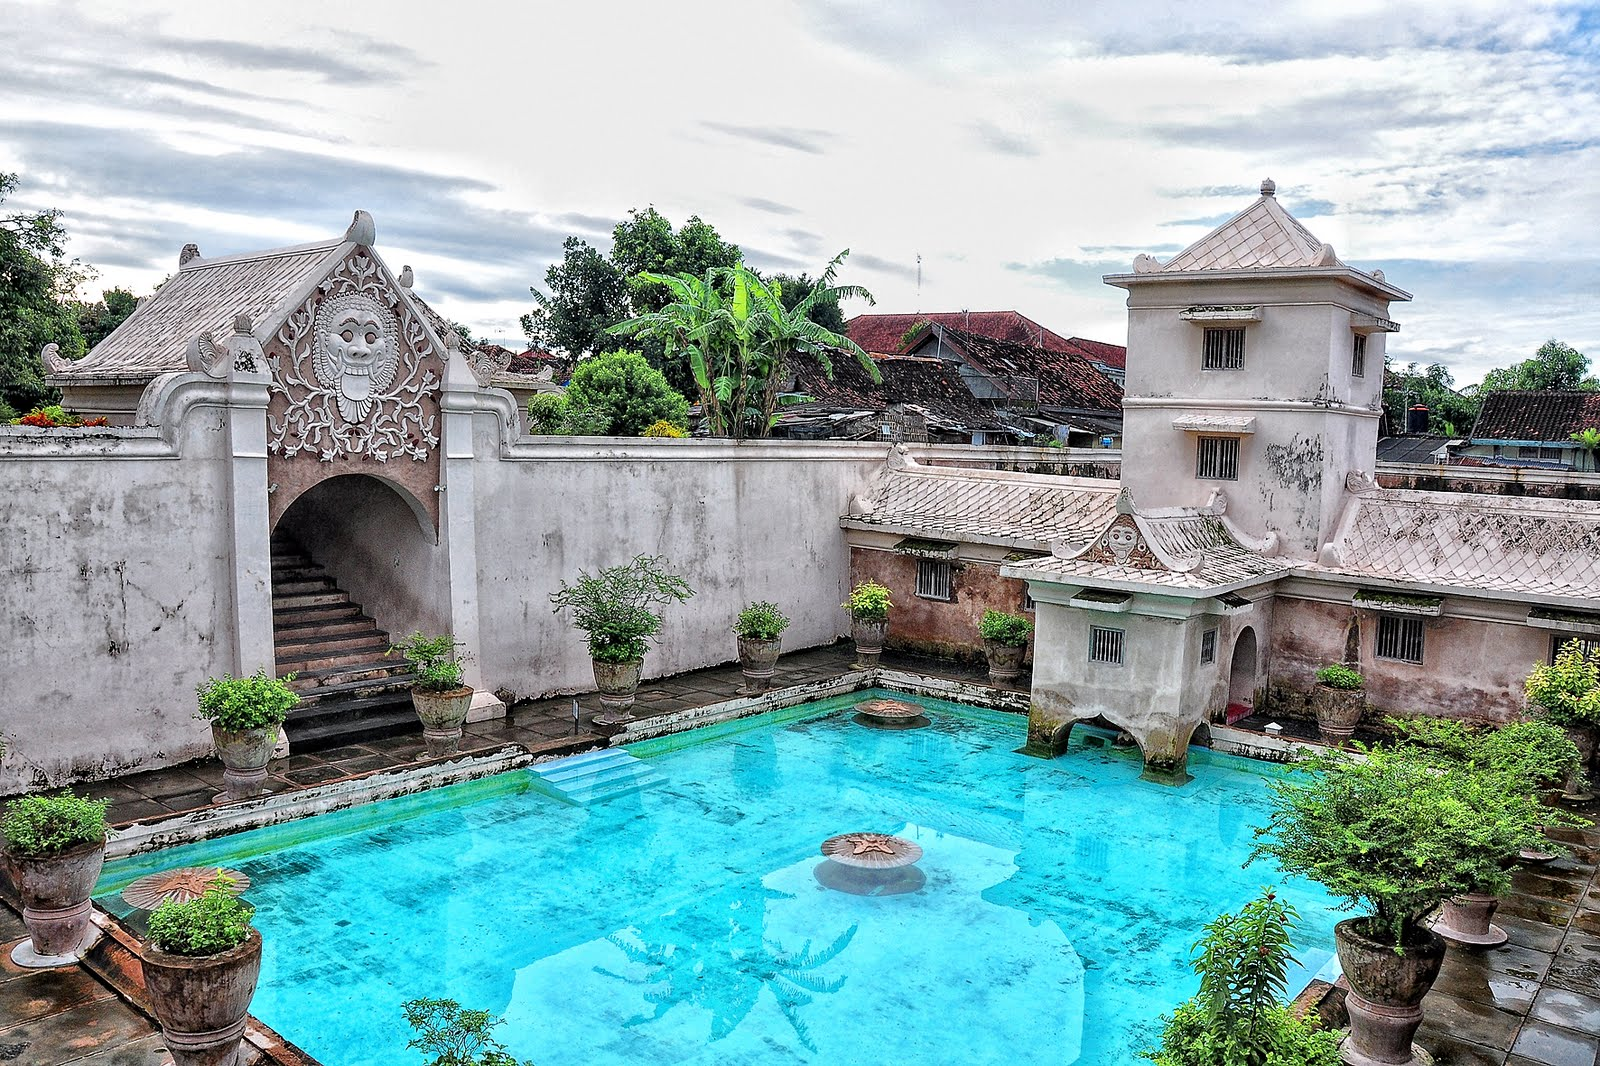 Taman Sari Keraton Yogyakarta Foto Foto Hadiningrat Joss